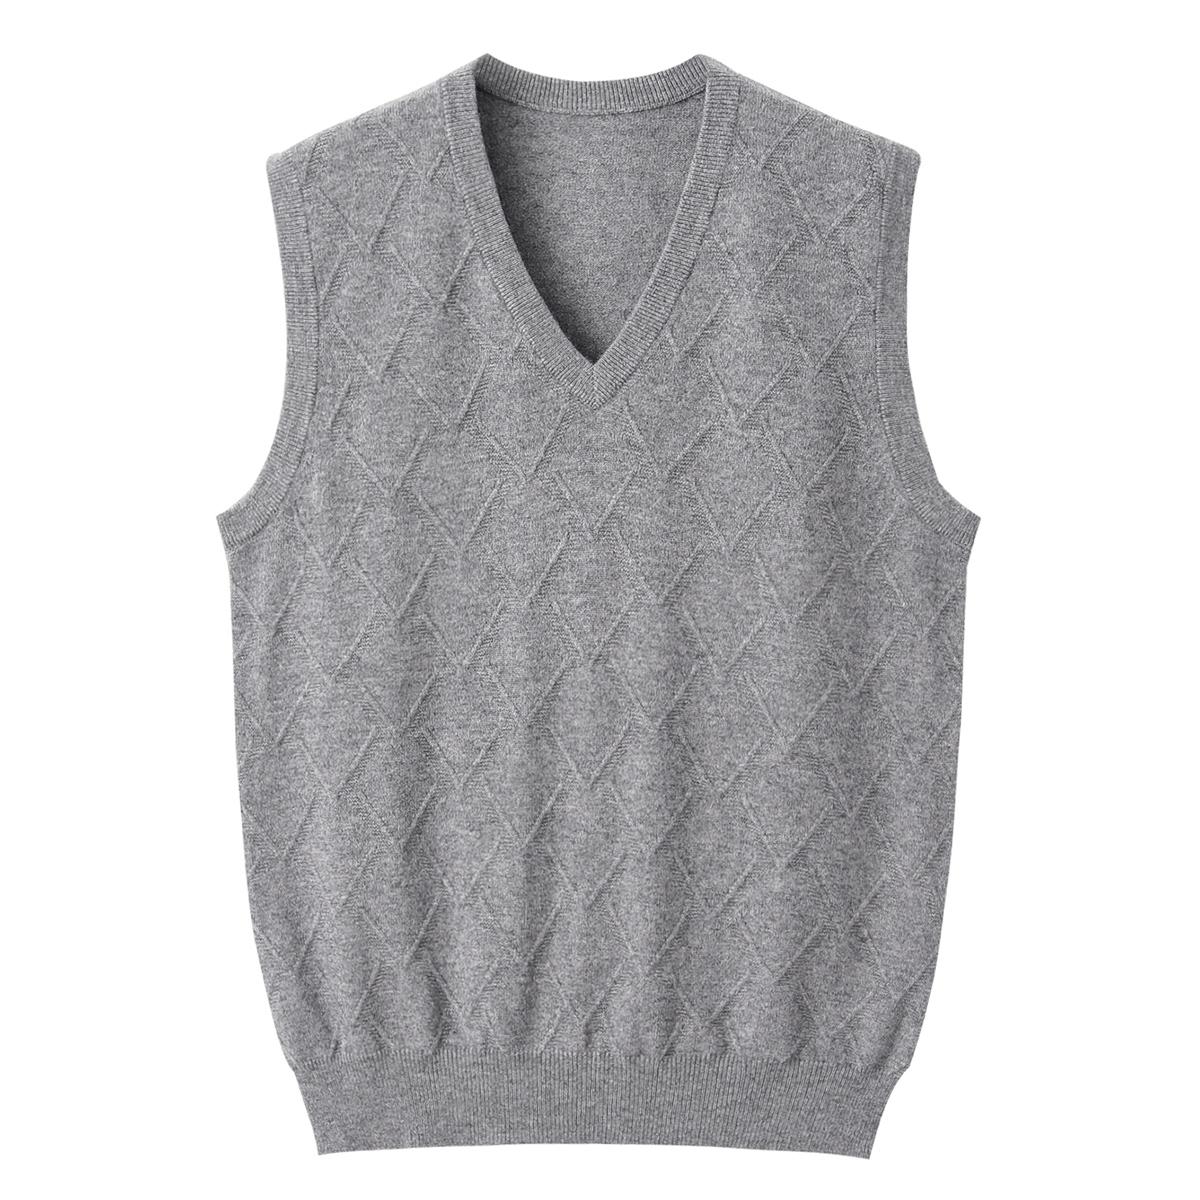 Xingrong Inner Mongolia cashmere sweater mens V-neck classic Plaid vest business casual VEST NEW shoulder